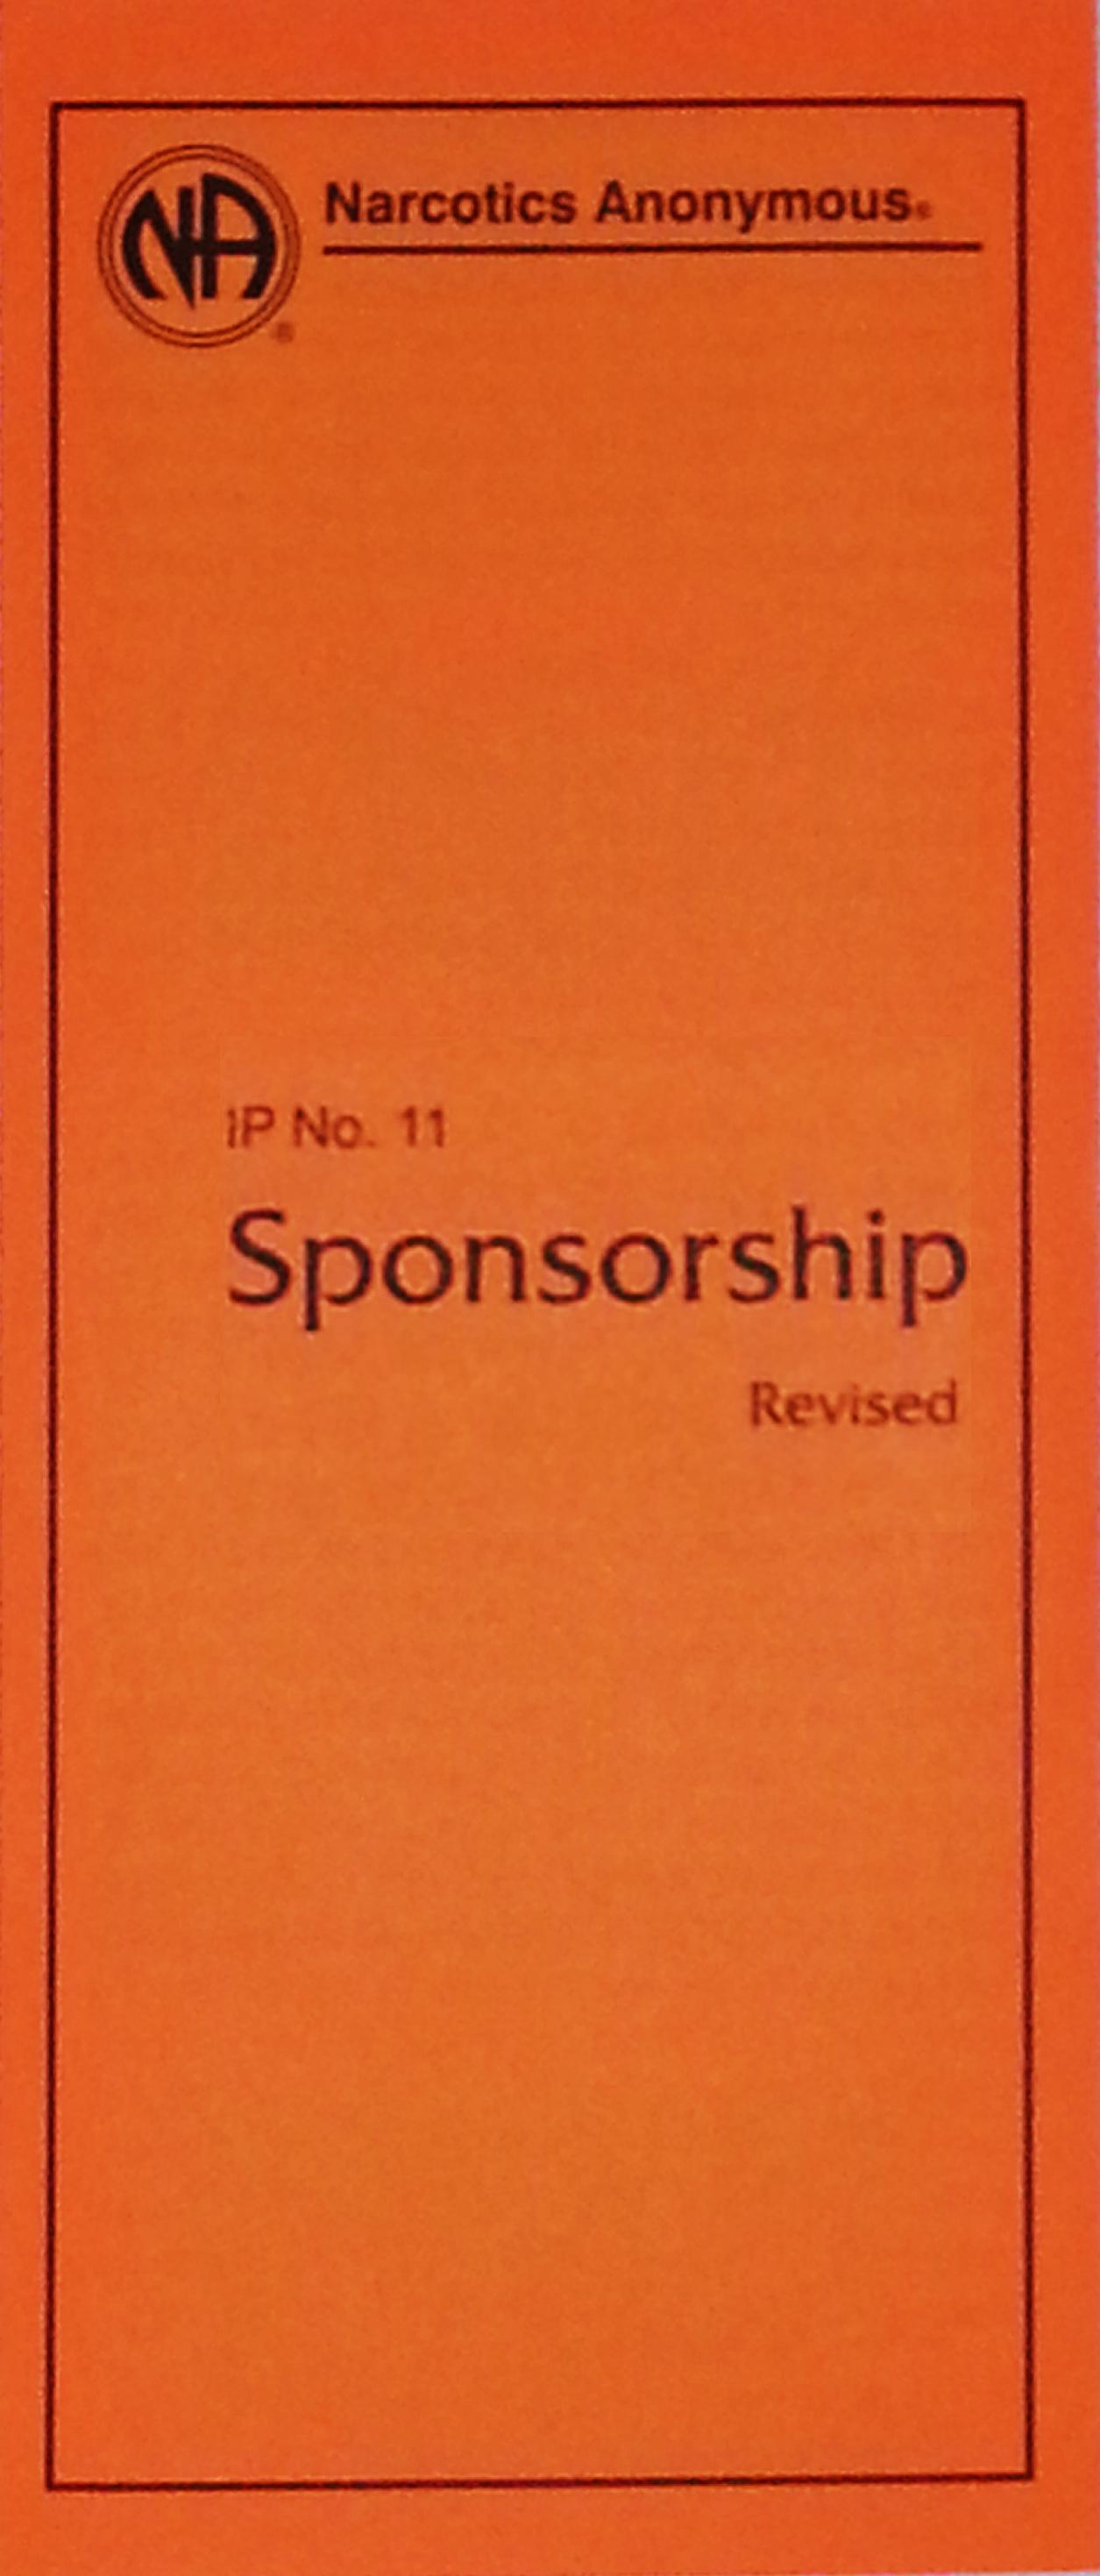 Narcotics Anonymous Information Pamphlet, IP#11, Sponsorship